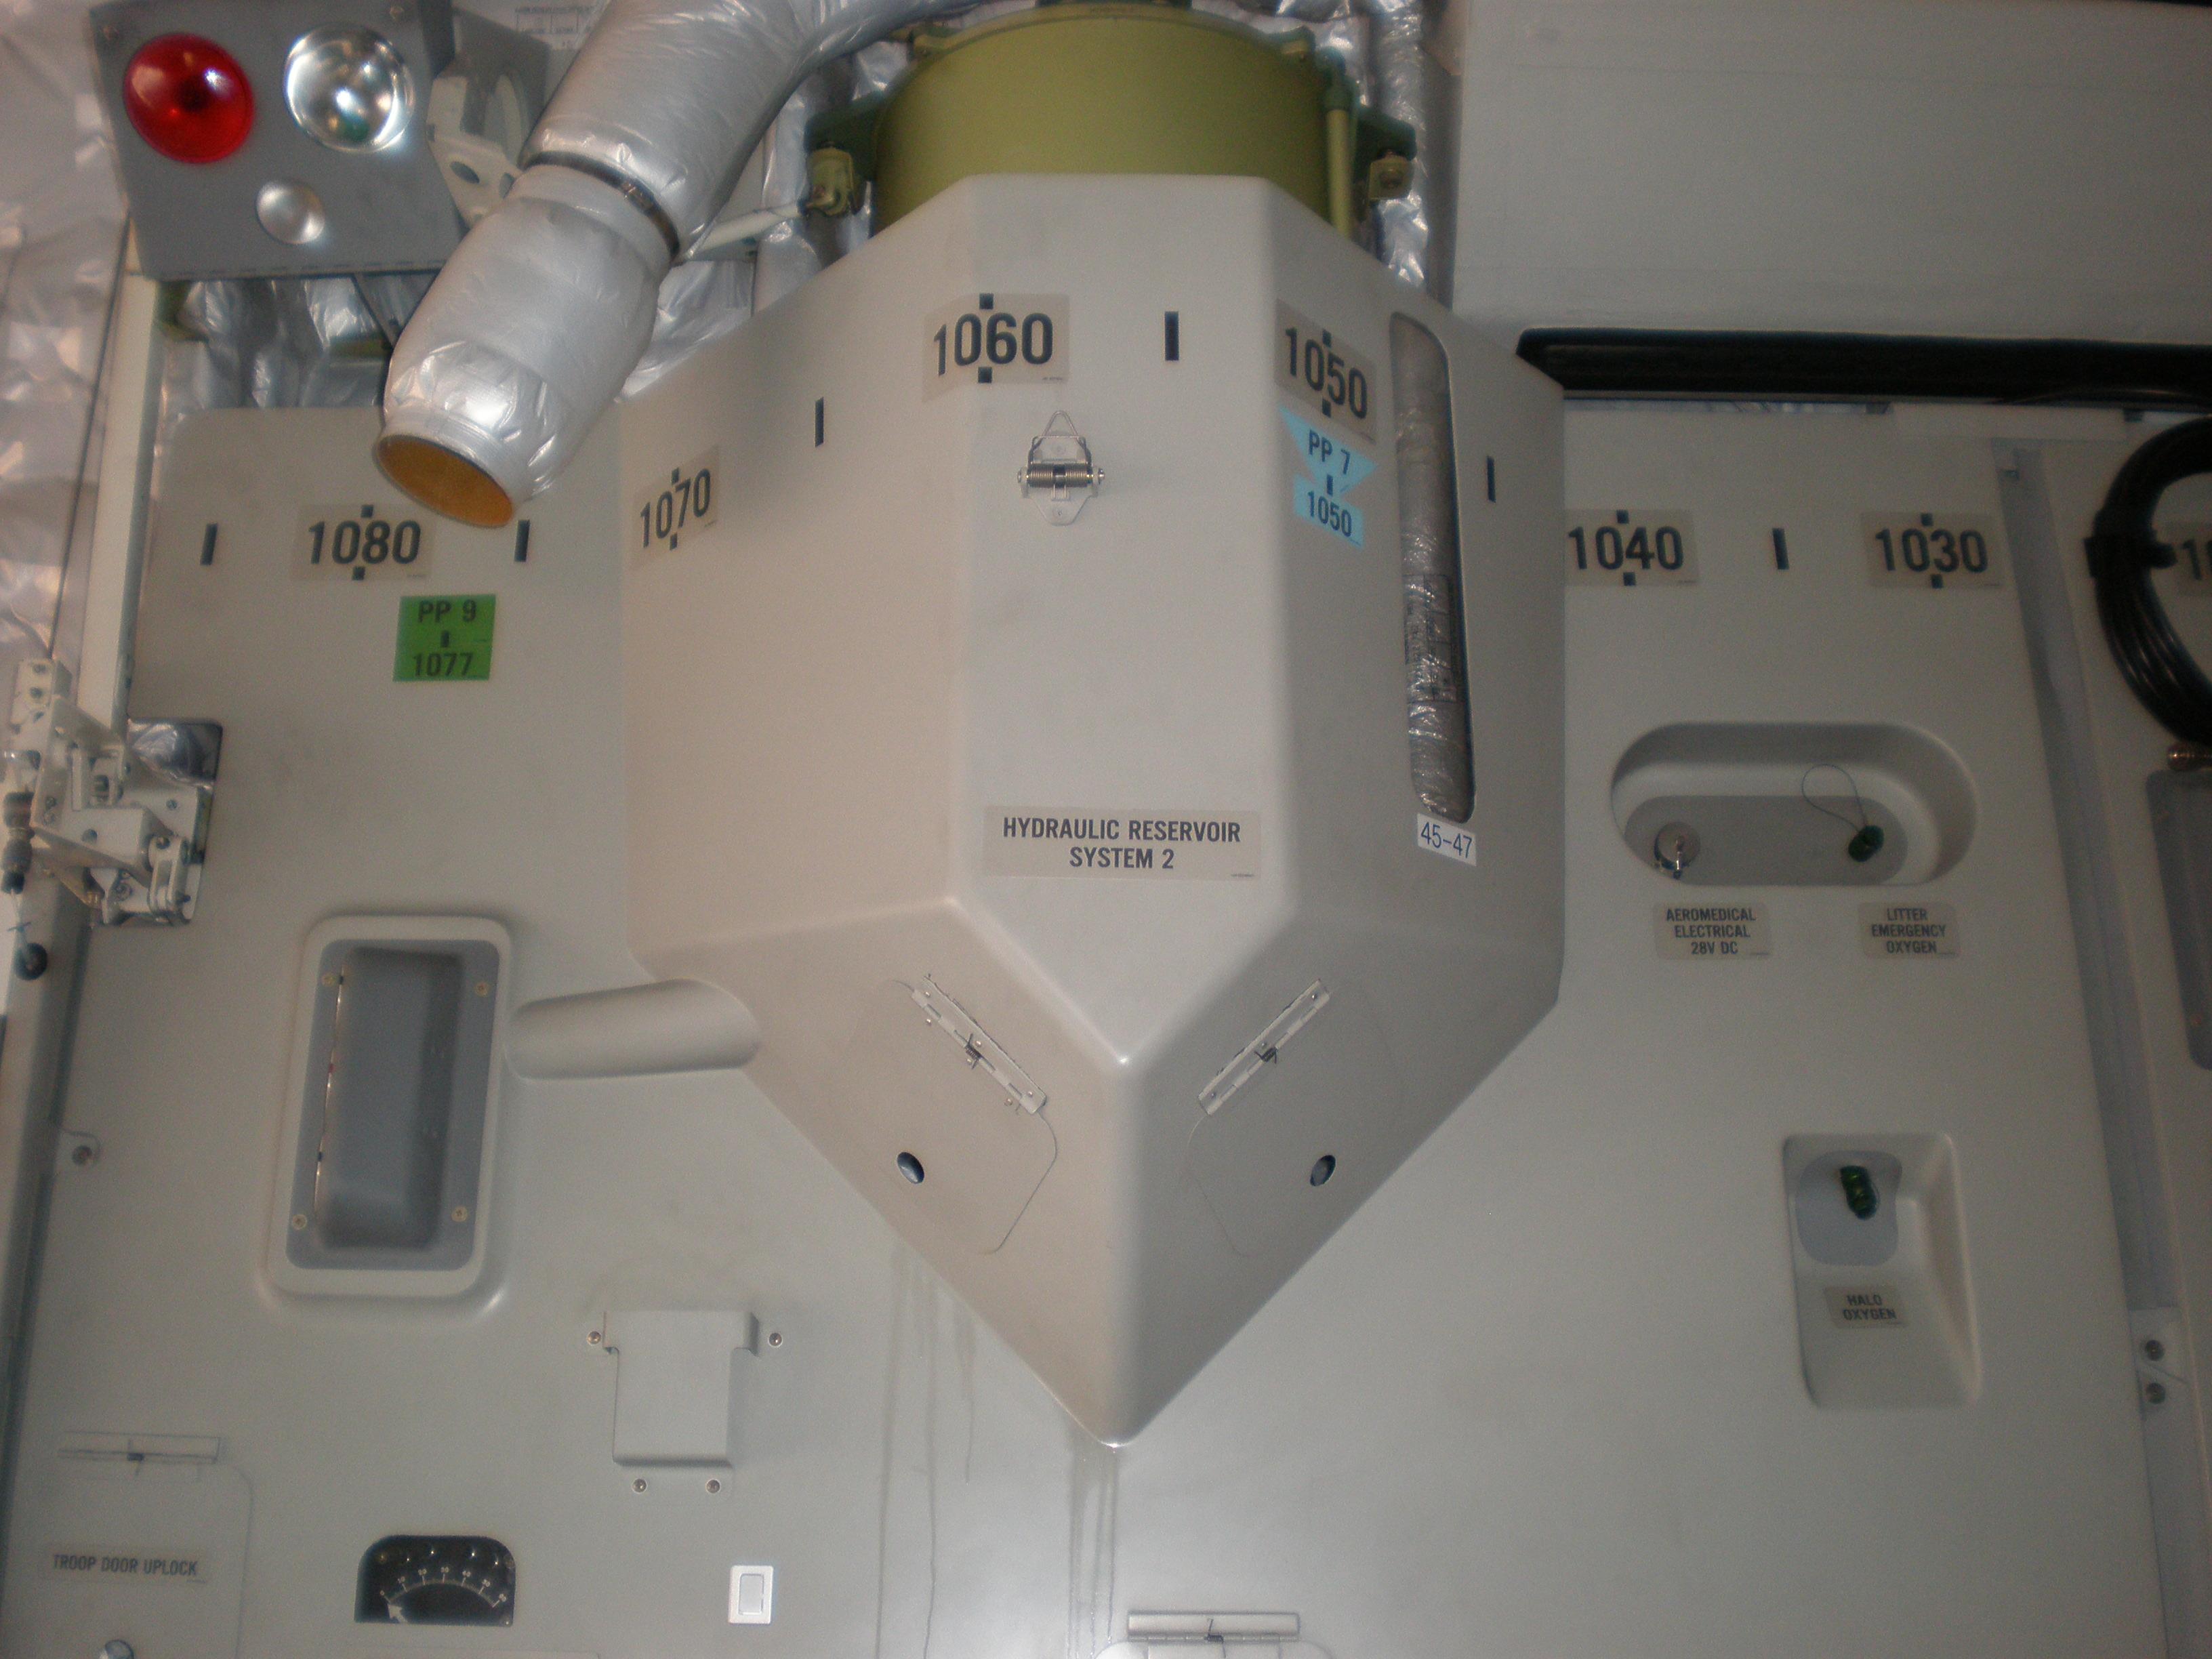 File:C-17 Globemaster III no  5139 hydraulic reservoir